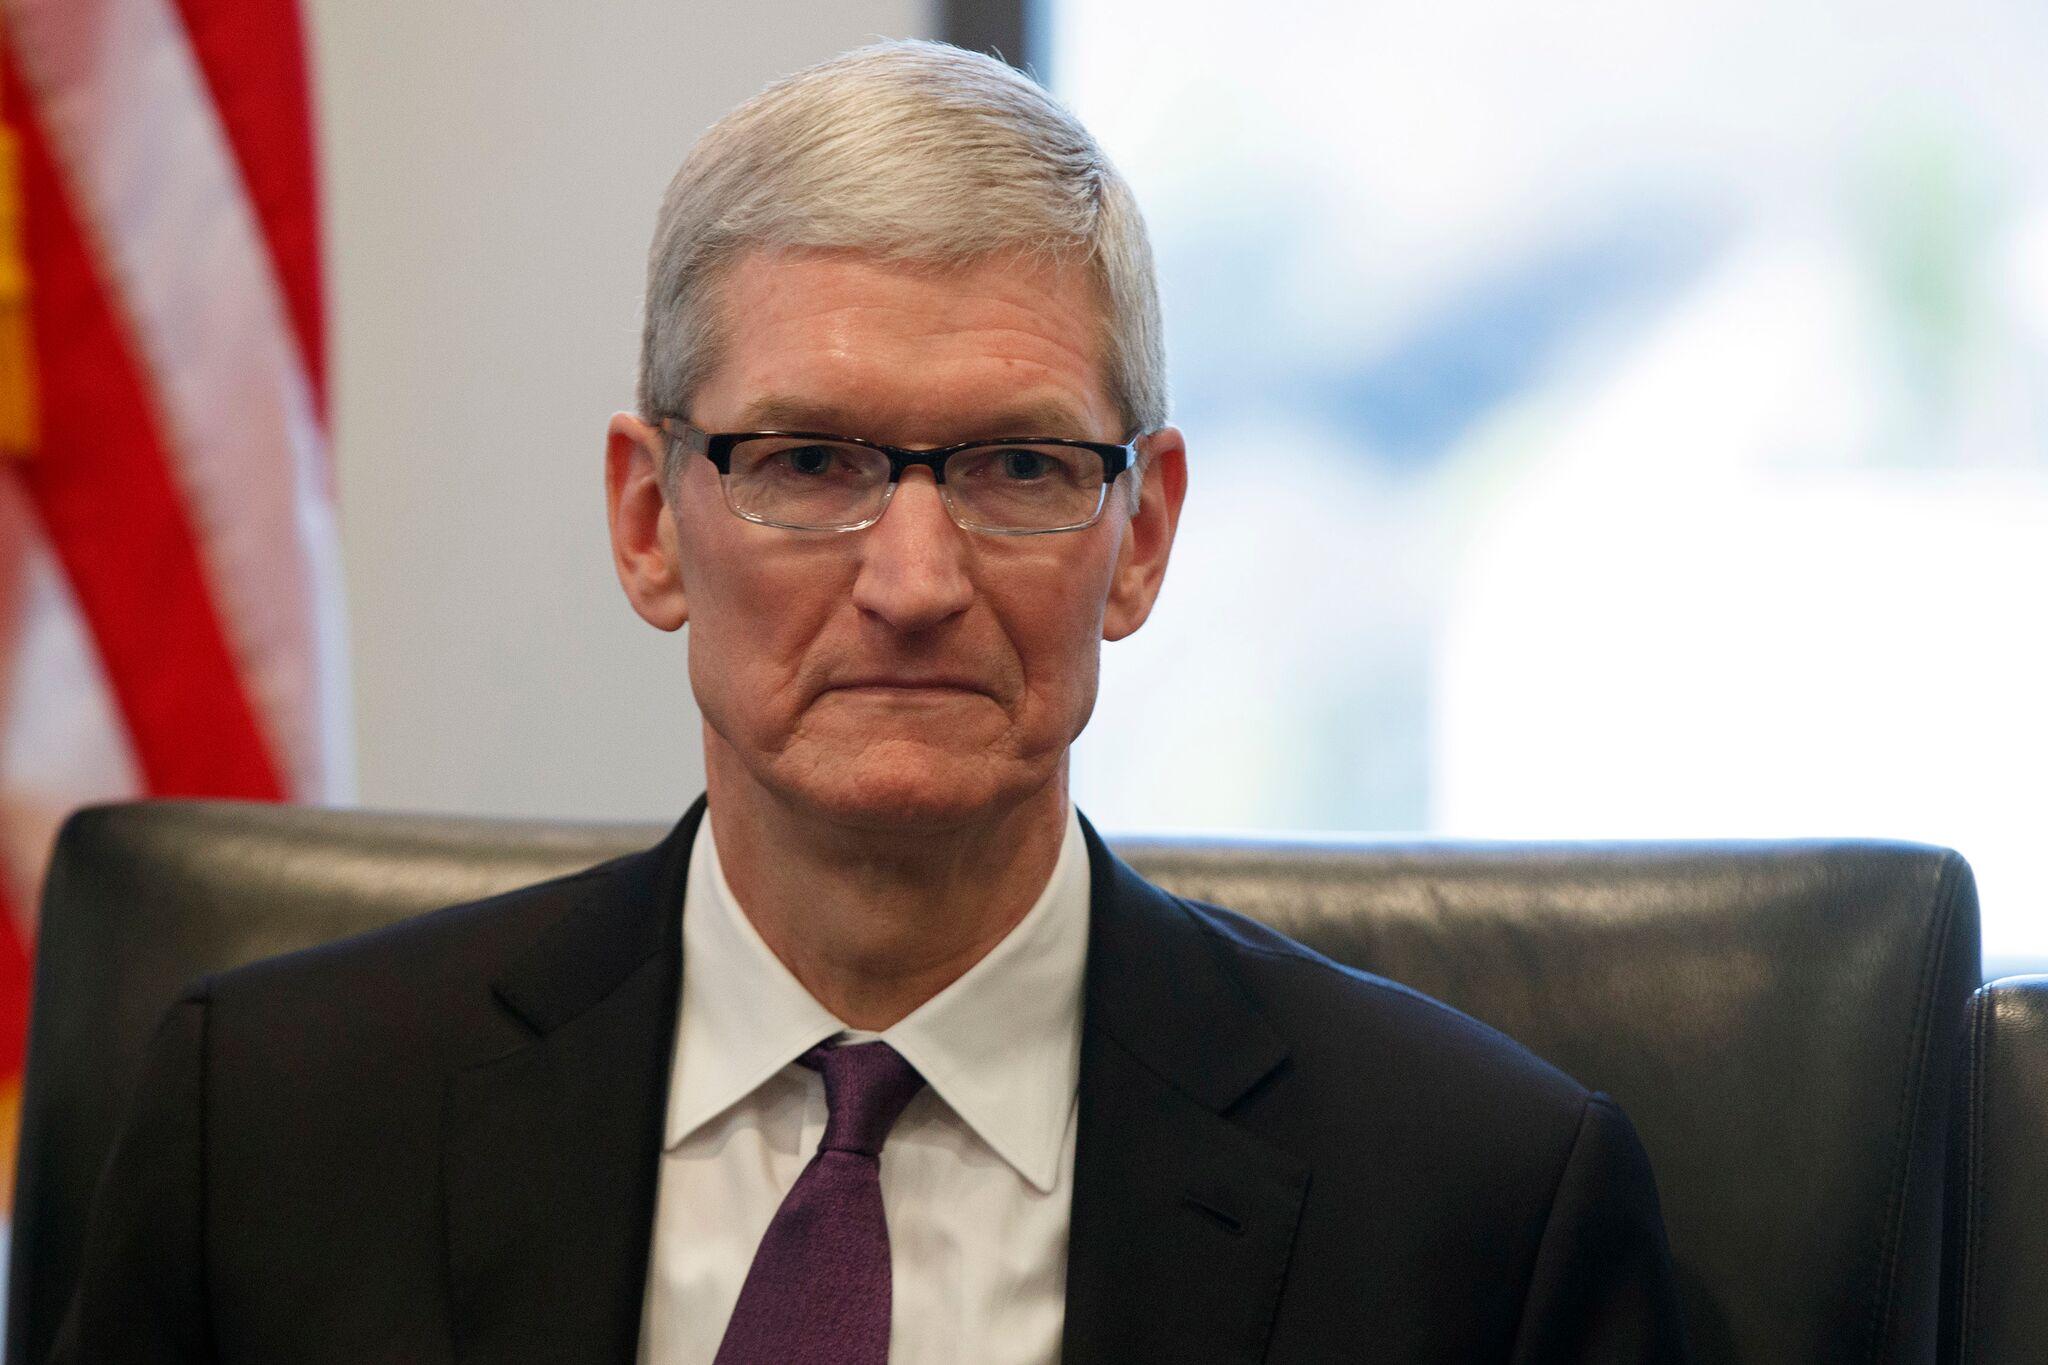 Apple ed obsolescenza programmata, la Francia indaga